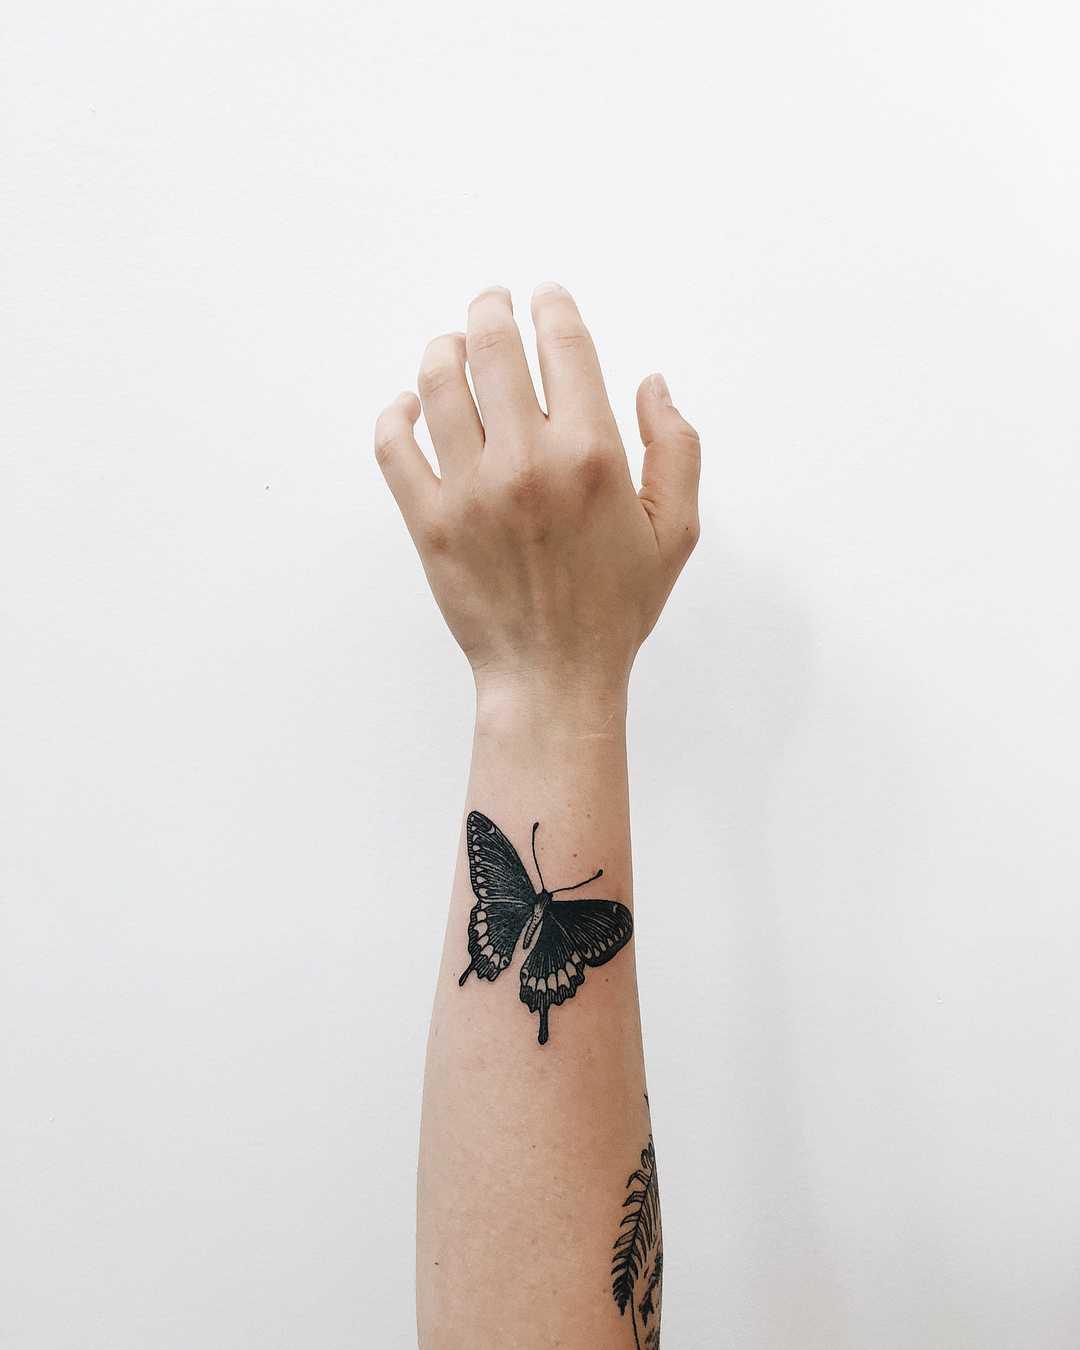 Wonderful butterfly tattoo